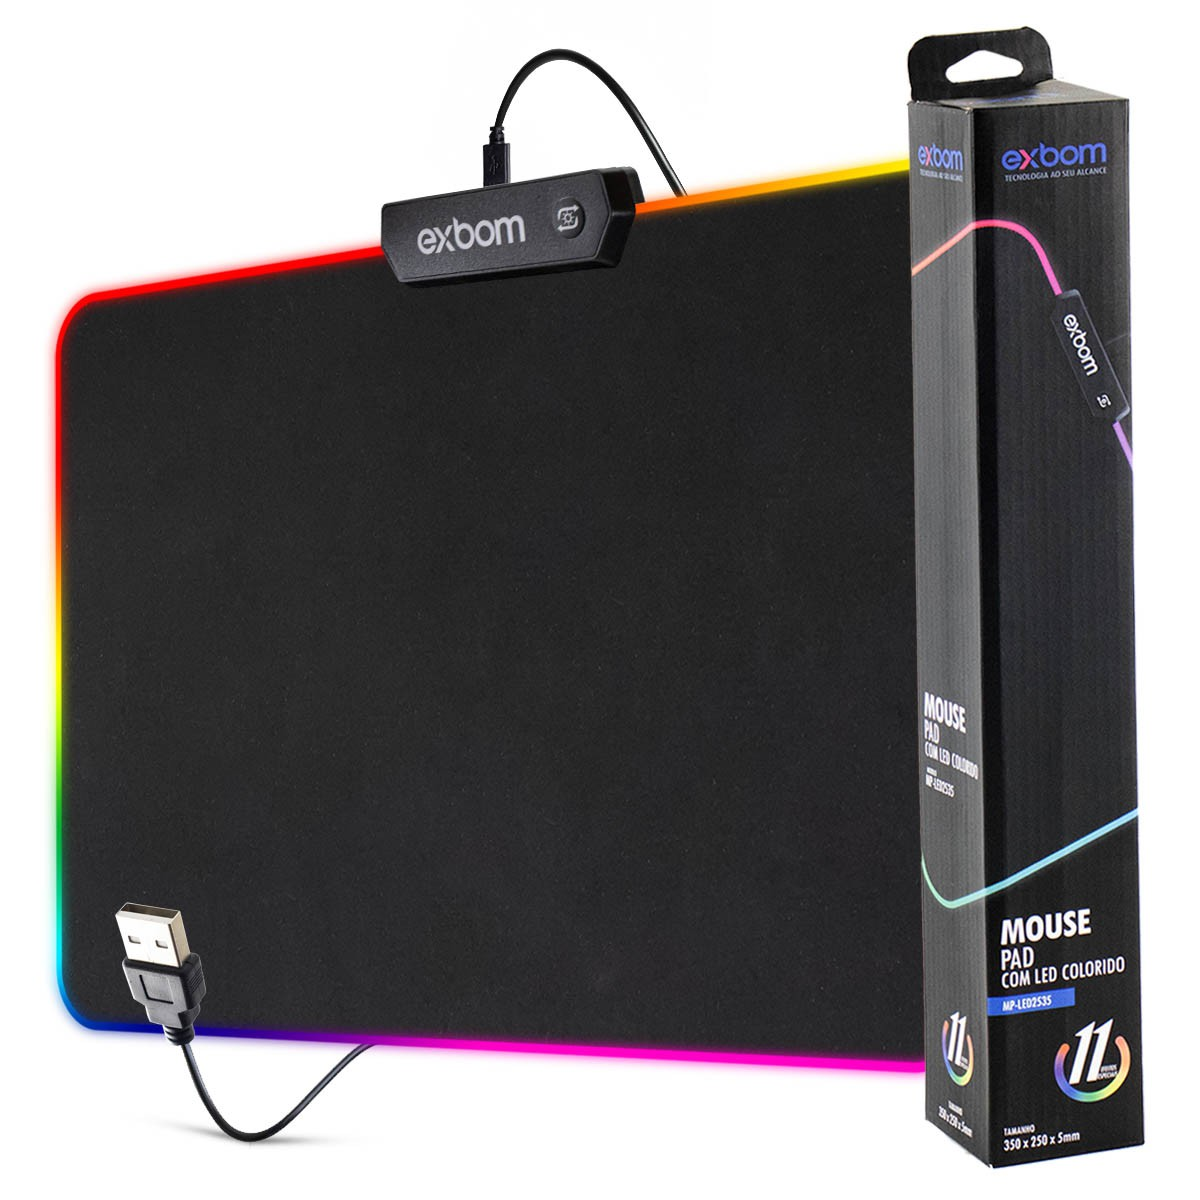 Mouse Pad Gamer com LEDs RGB 7 Cores Exbom MP-LED2535 250x350x4mm